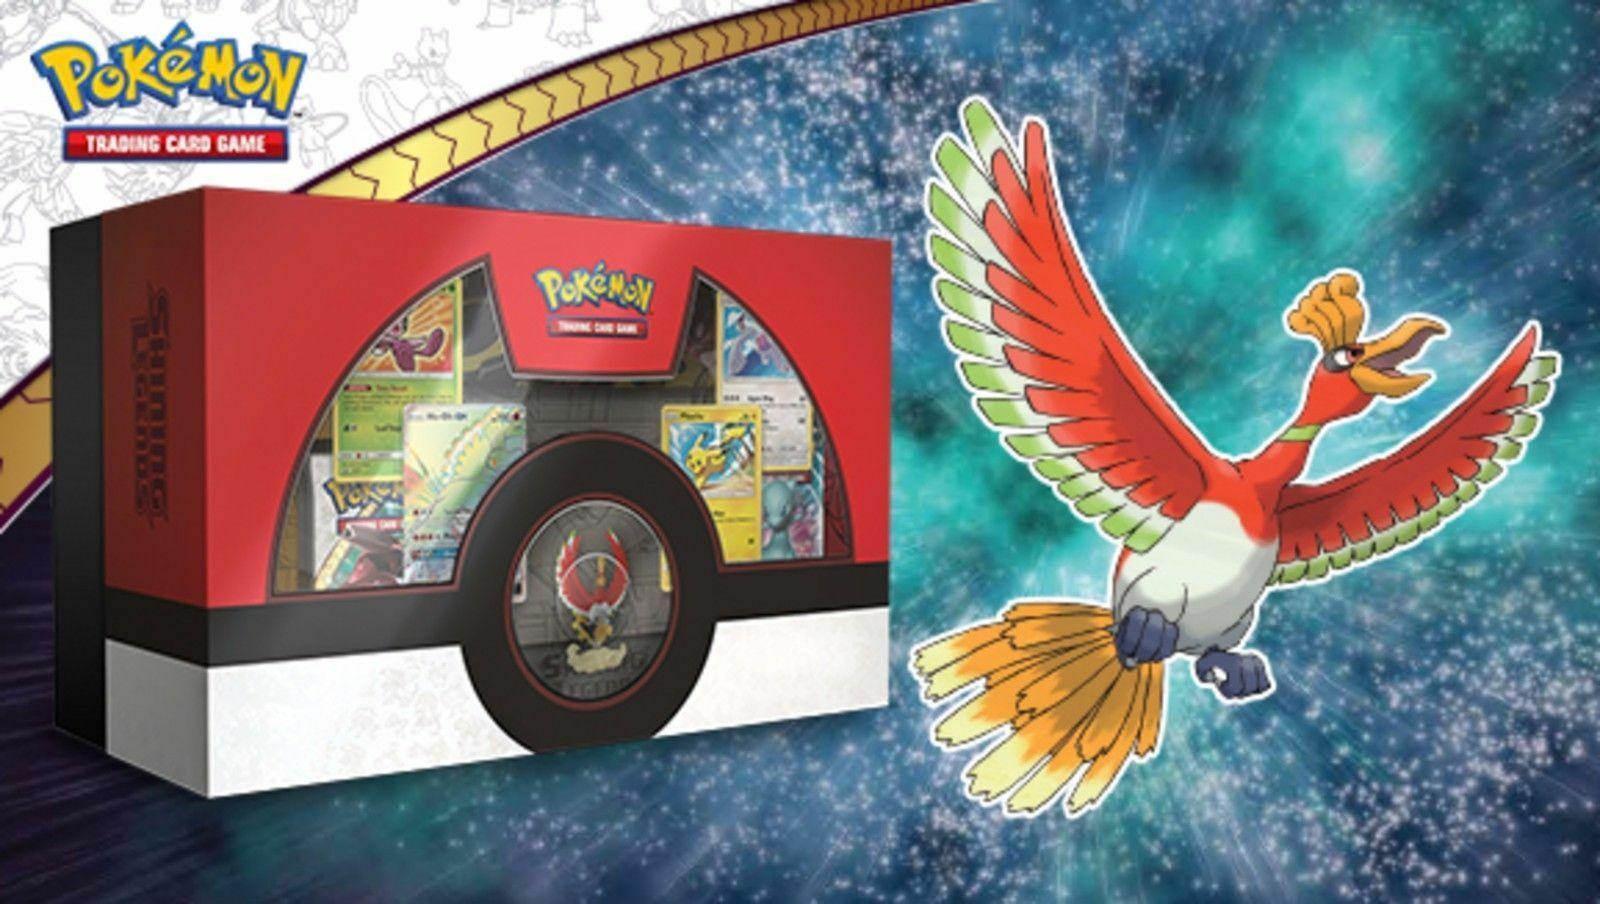 Pokemon Shining Legends Ho-Oh + Mew Mewtwo Super Premium Collection Boxes Bundle image 6